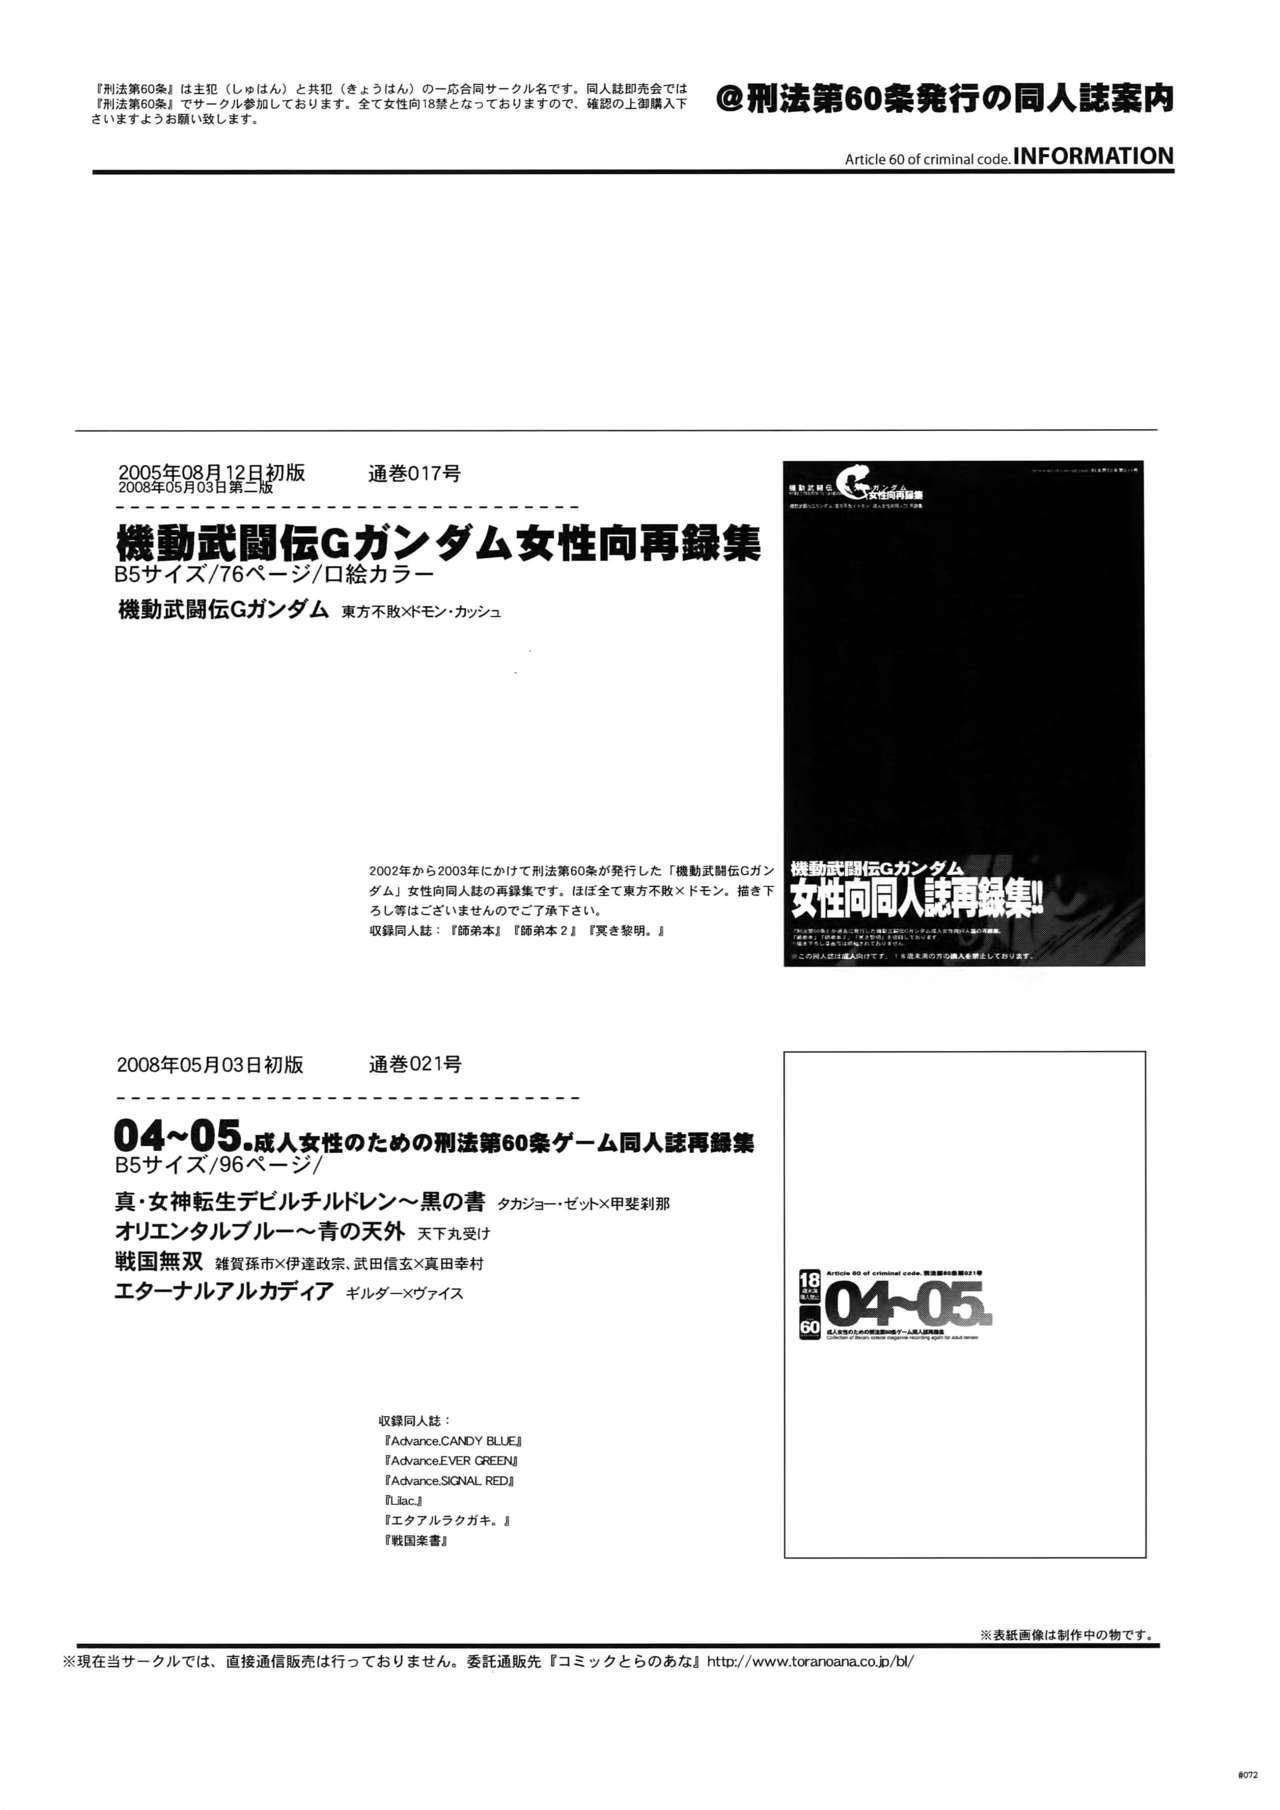 [Article 60 of Criminal Code (Shuhan)] G-gan Josei-Muke Sairoku-Shuu (G Gundam) 71